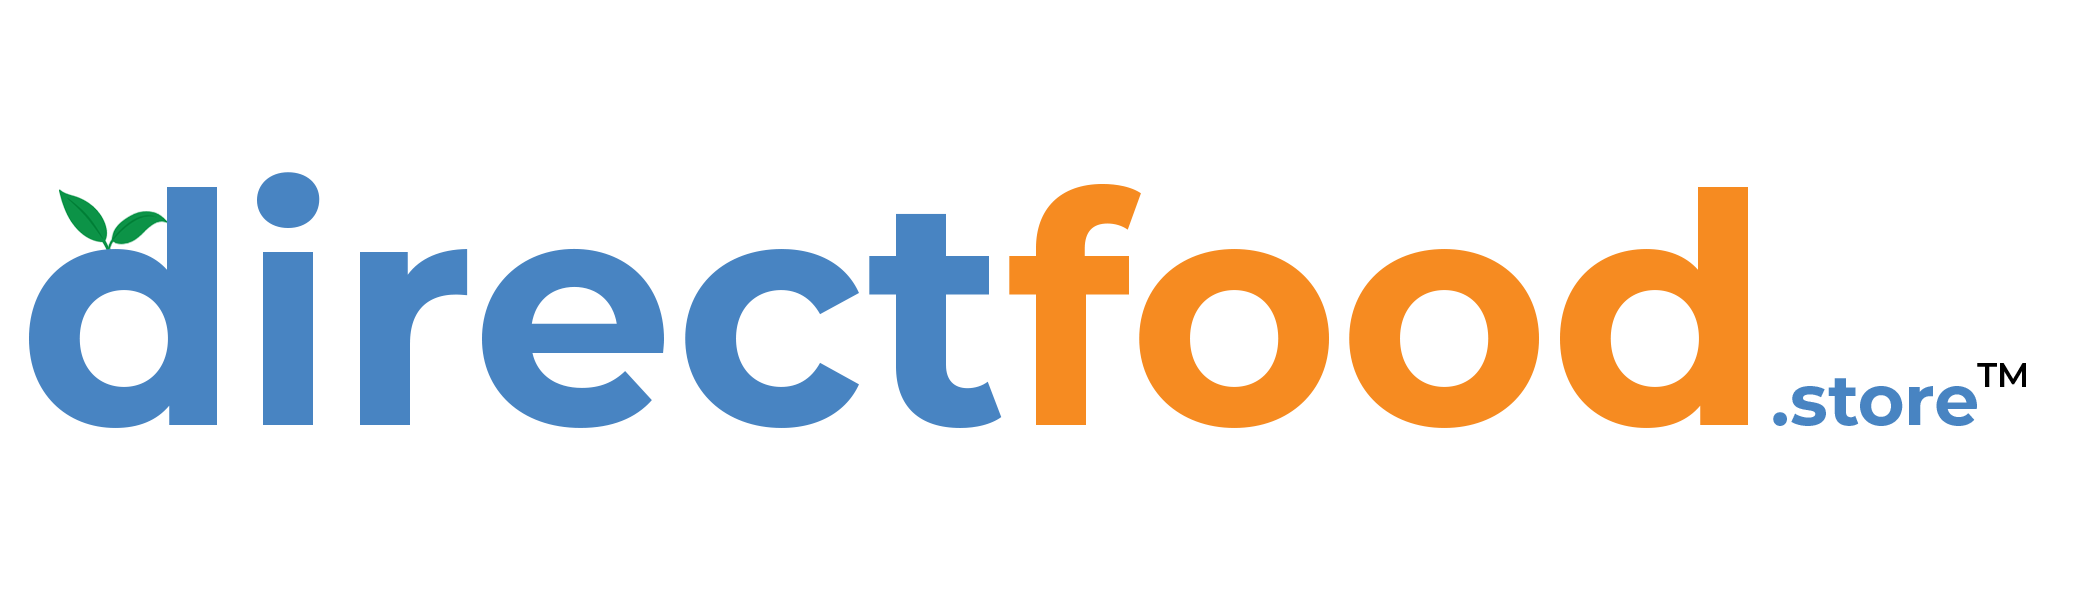 DirectFood.store Online Grocery Platform